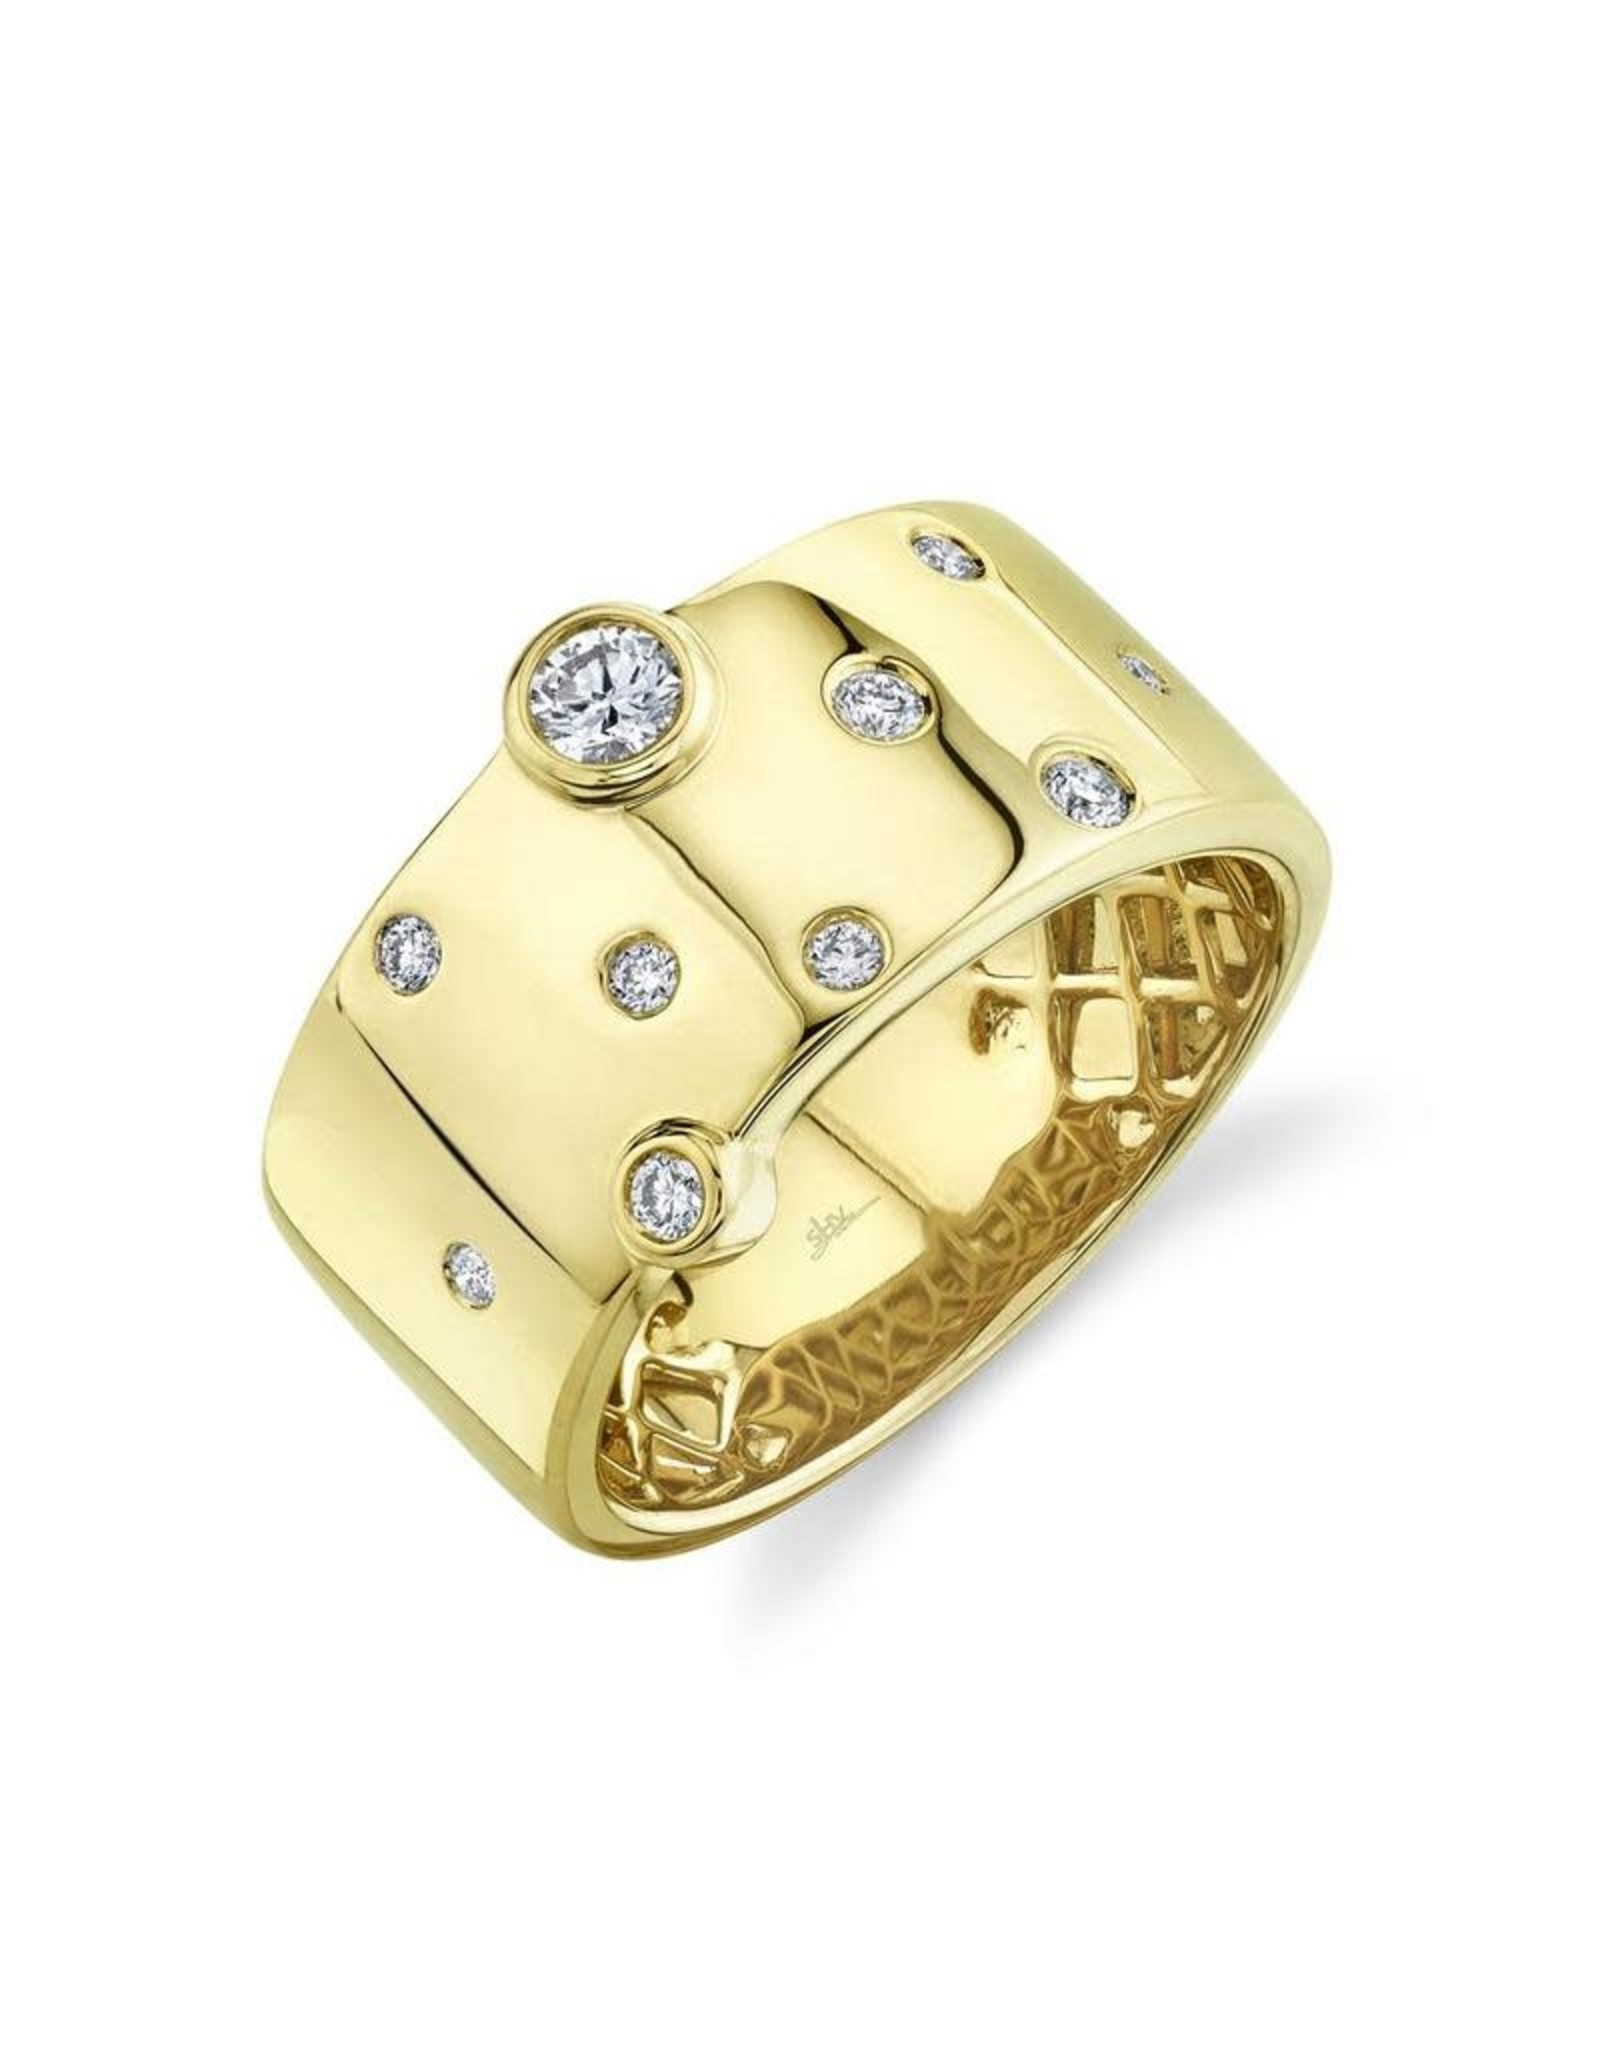 14K Yellow Gold Wide Bezel Set Diamond Fashion Ring, D: 0.26ct